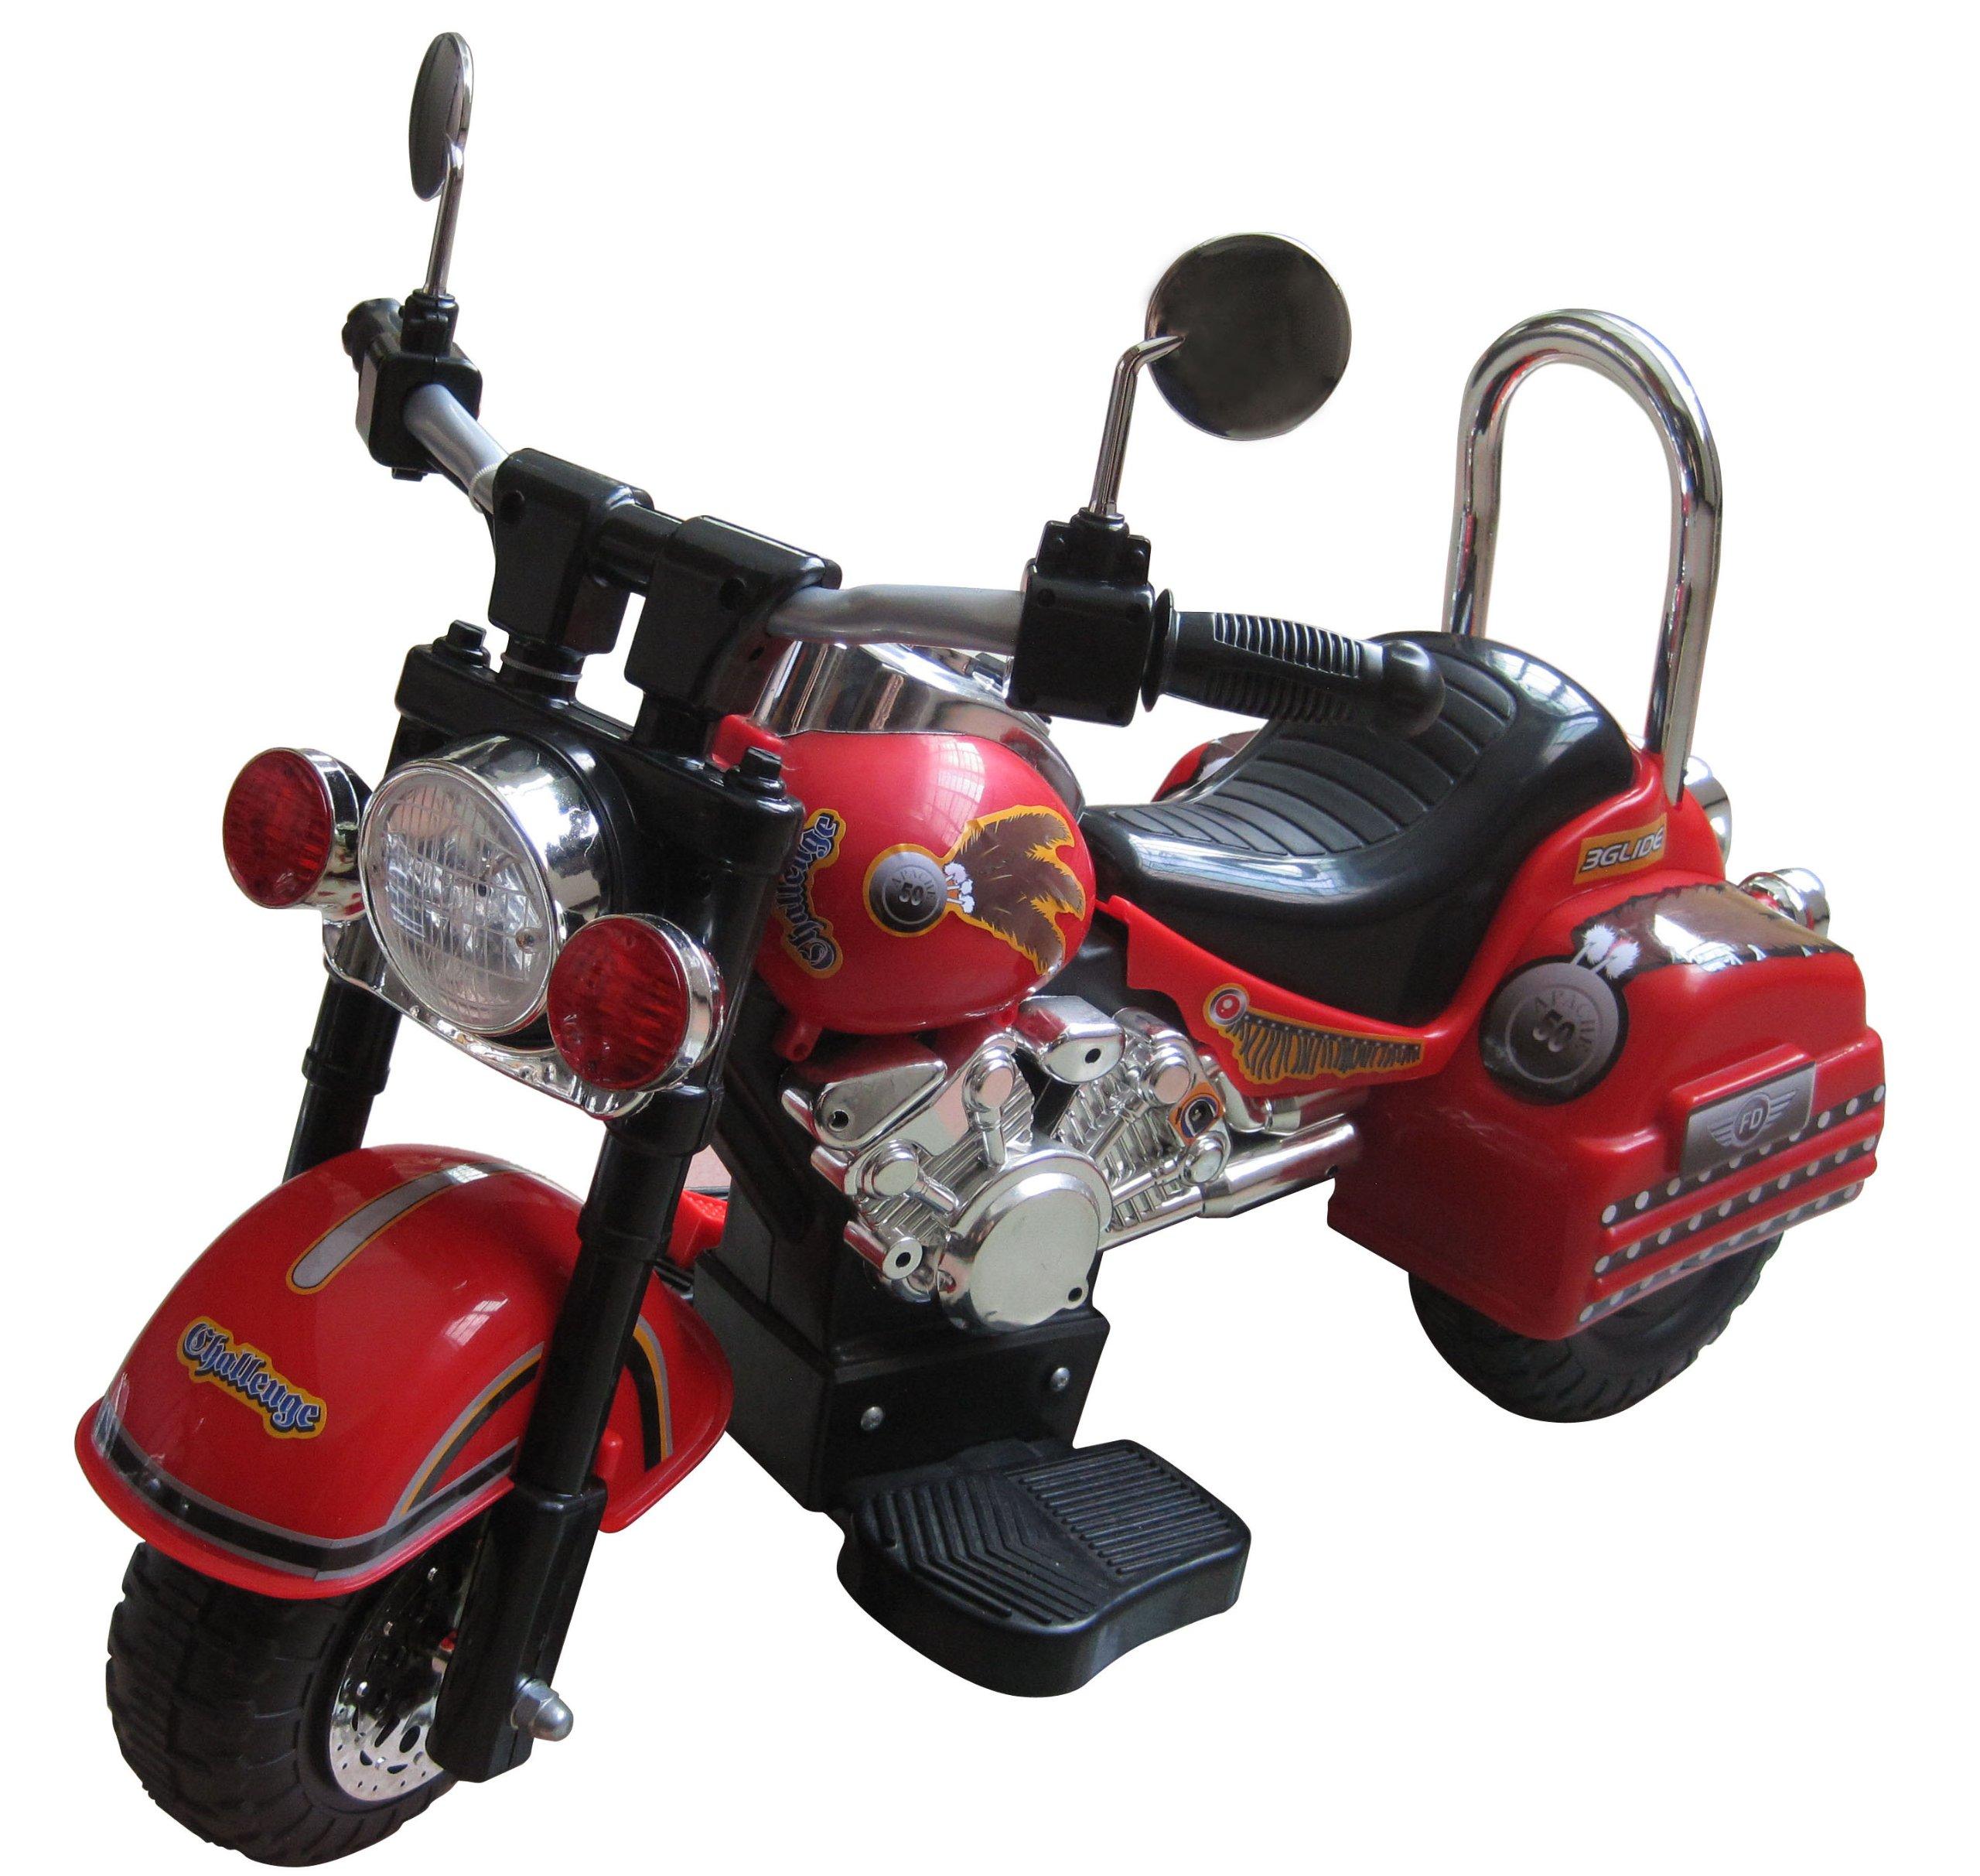 Merske Harley Style 6V Battery Operated Kids Motorcycle, Red by Merske